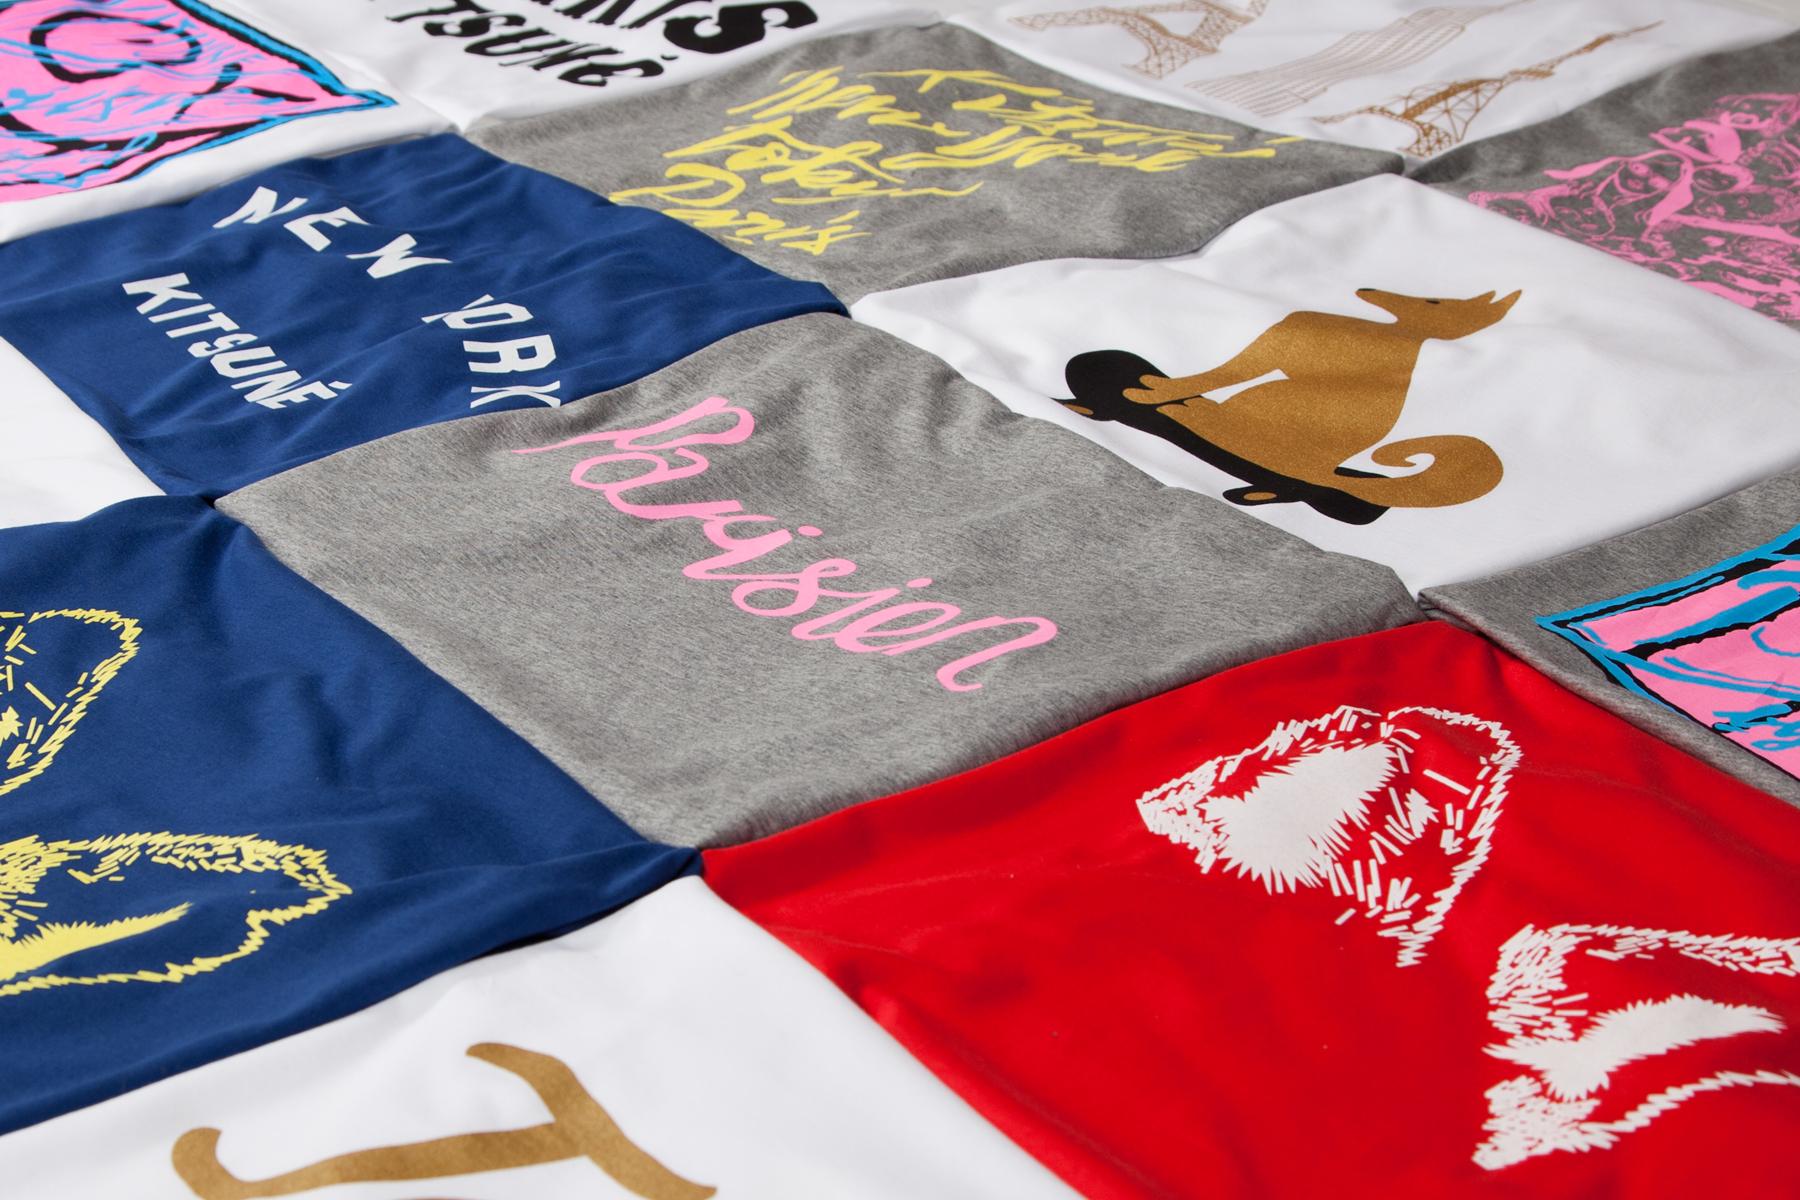 kitsune tee 2013 pre fall t shirts